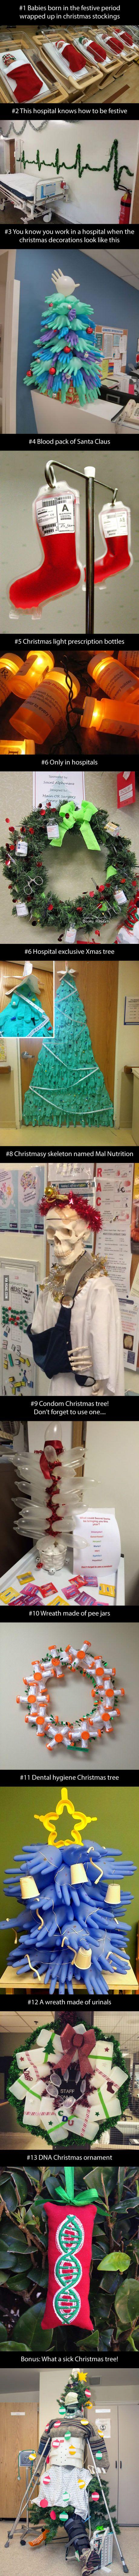 Kick ass hospital decorations!